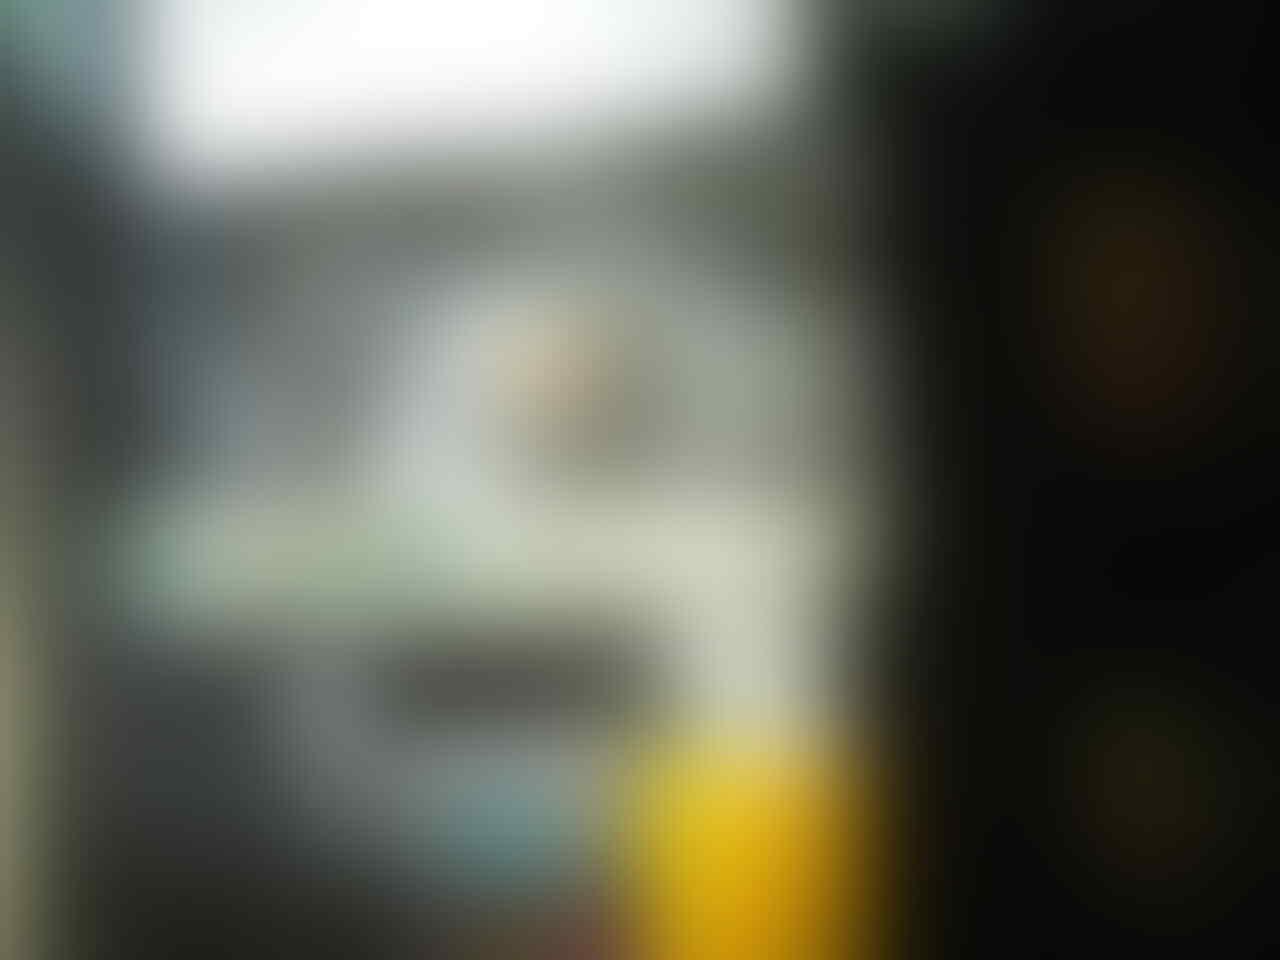 JUAL Blackberry 9105 Pearl Black 3G 1juta aja BEKASI mampir gan